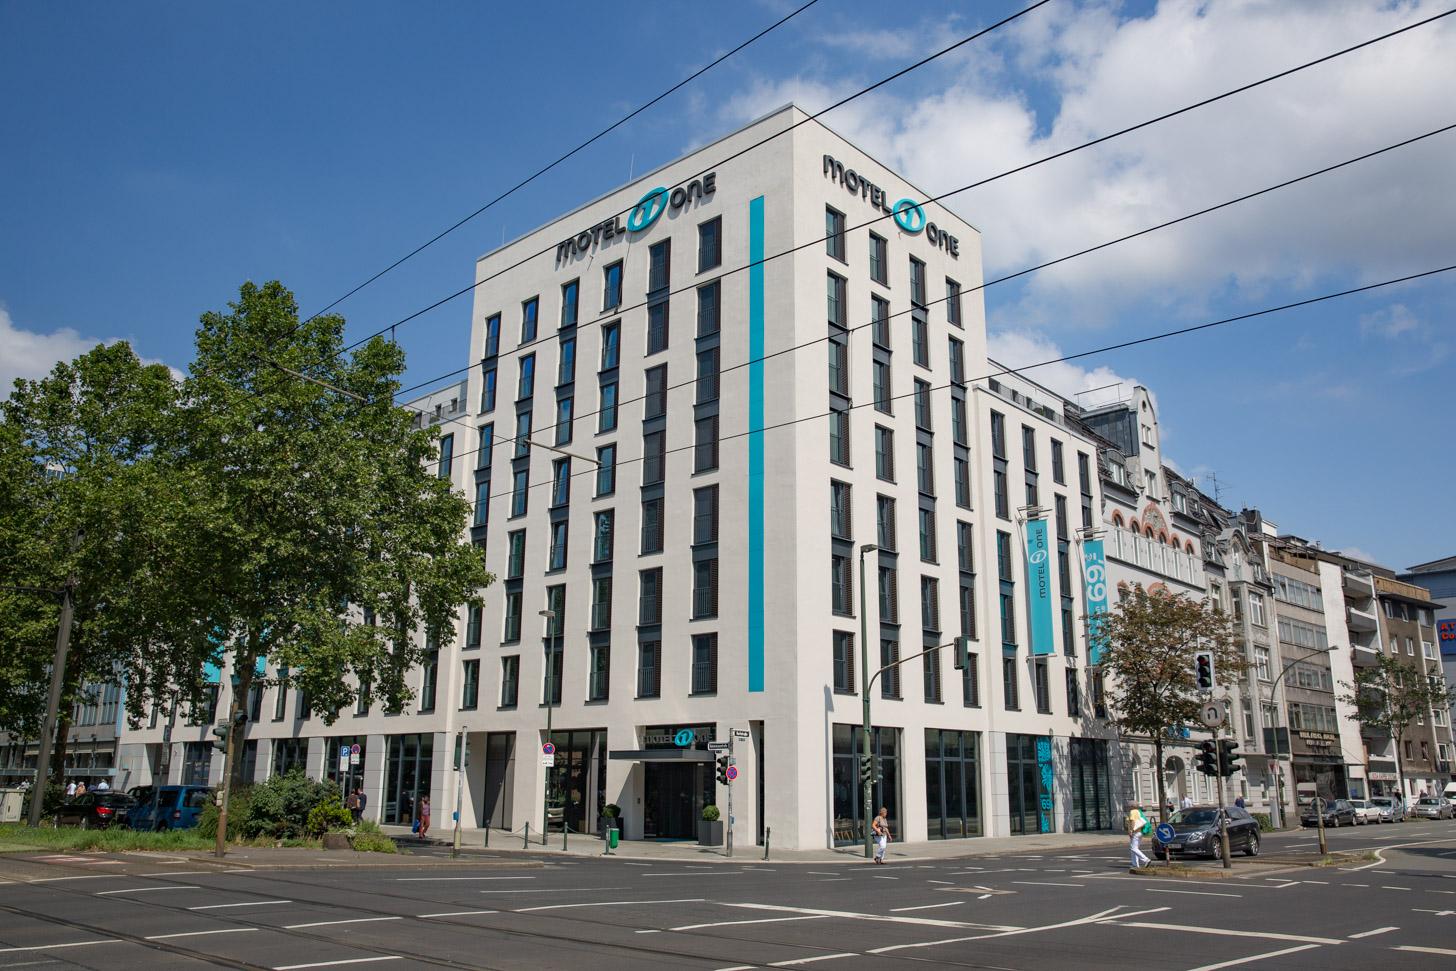 Motel 1 Düsseldorf